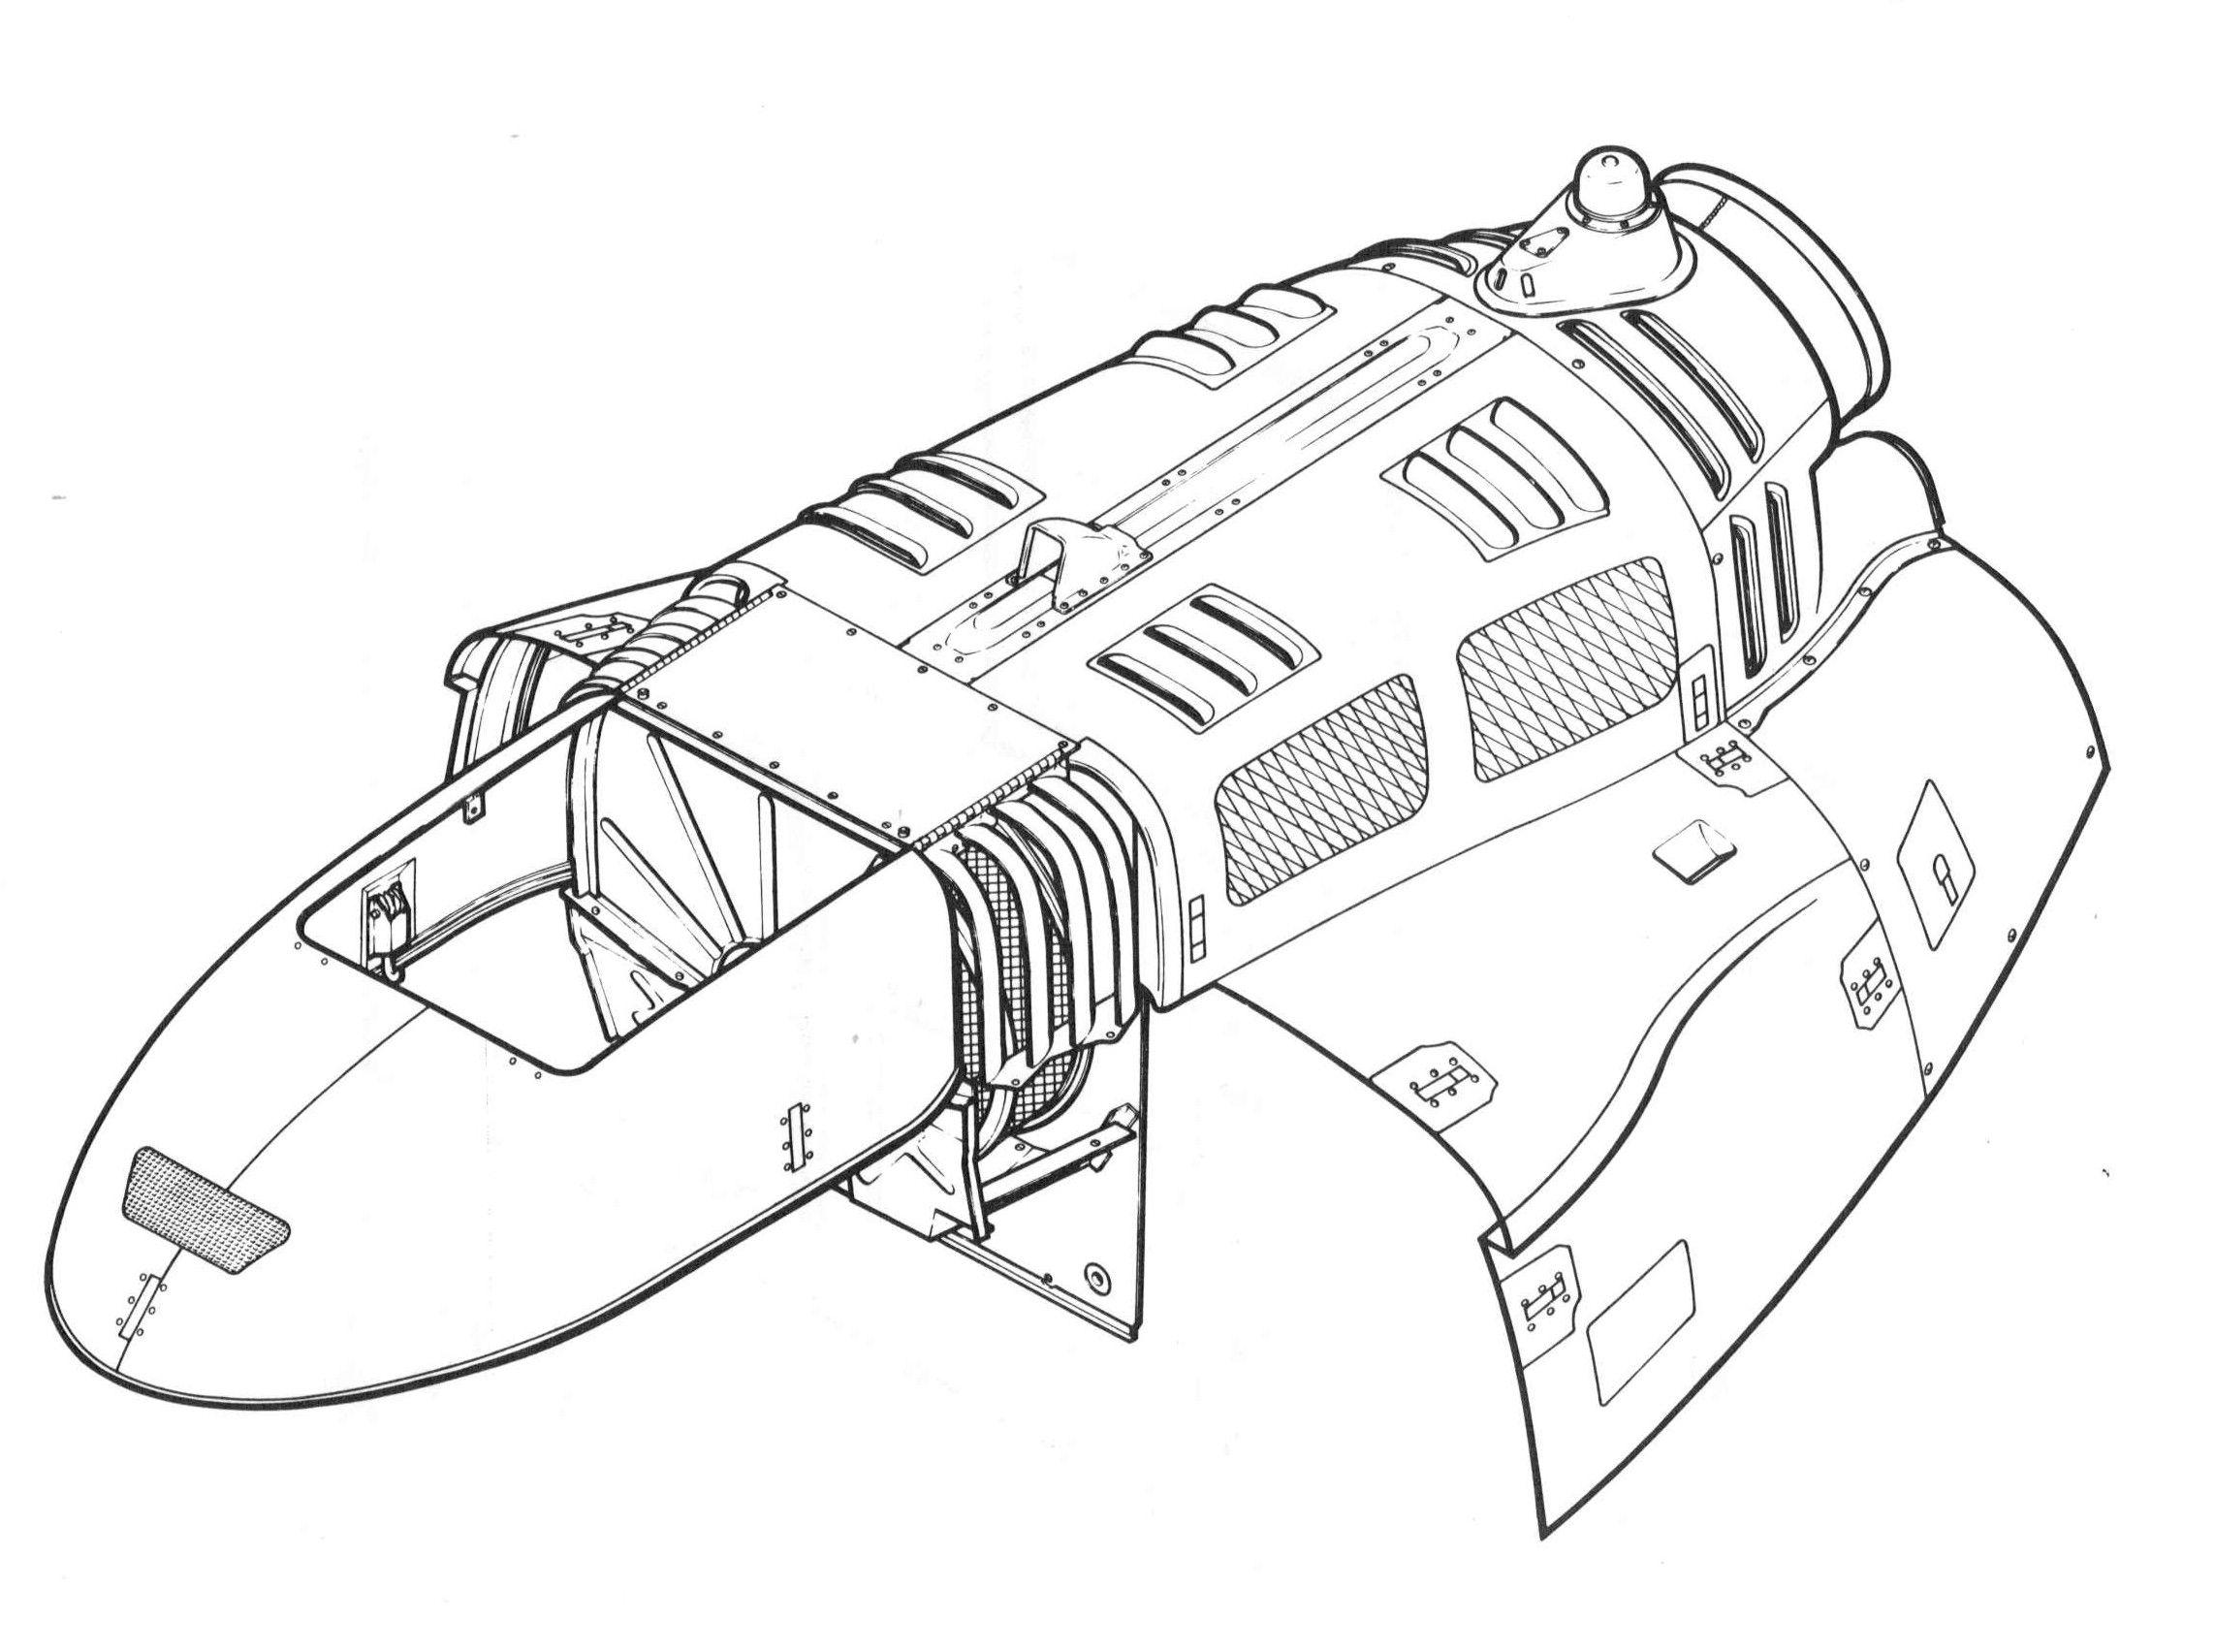 Engine cowling 5 8 2285×1704